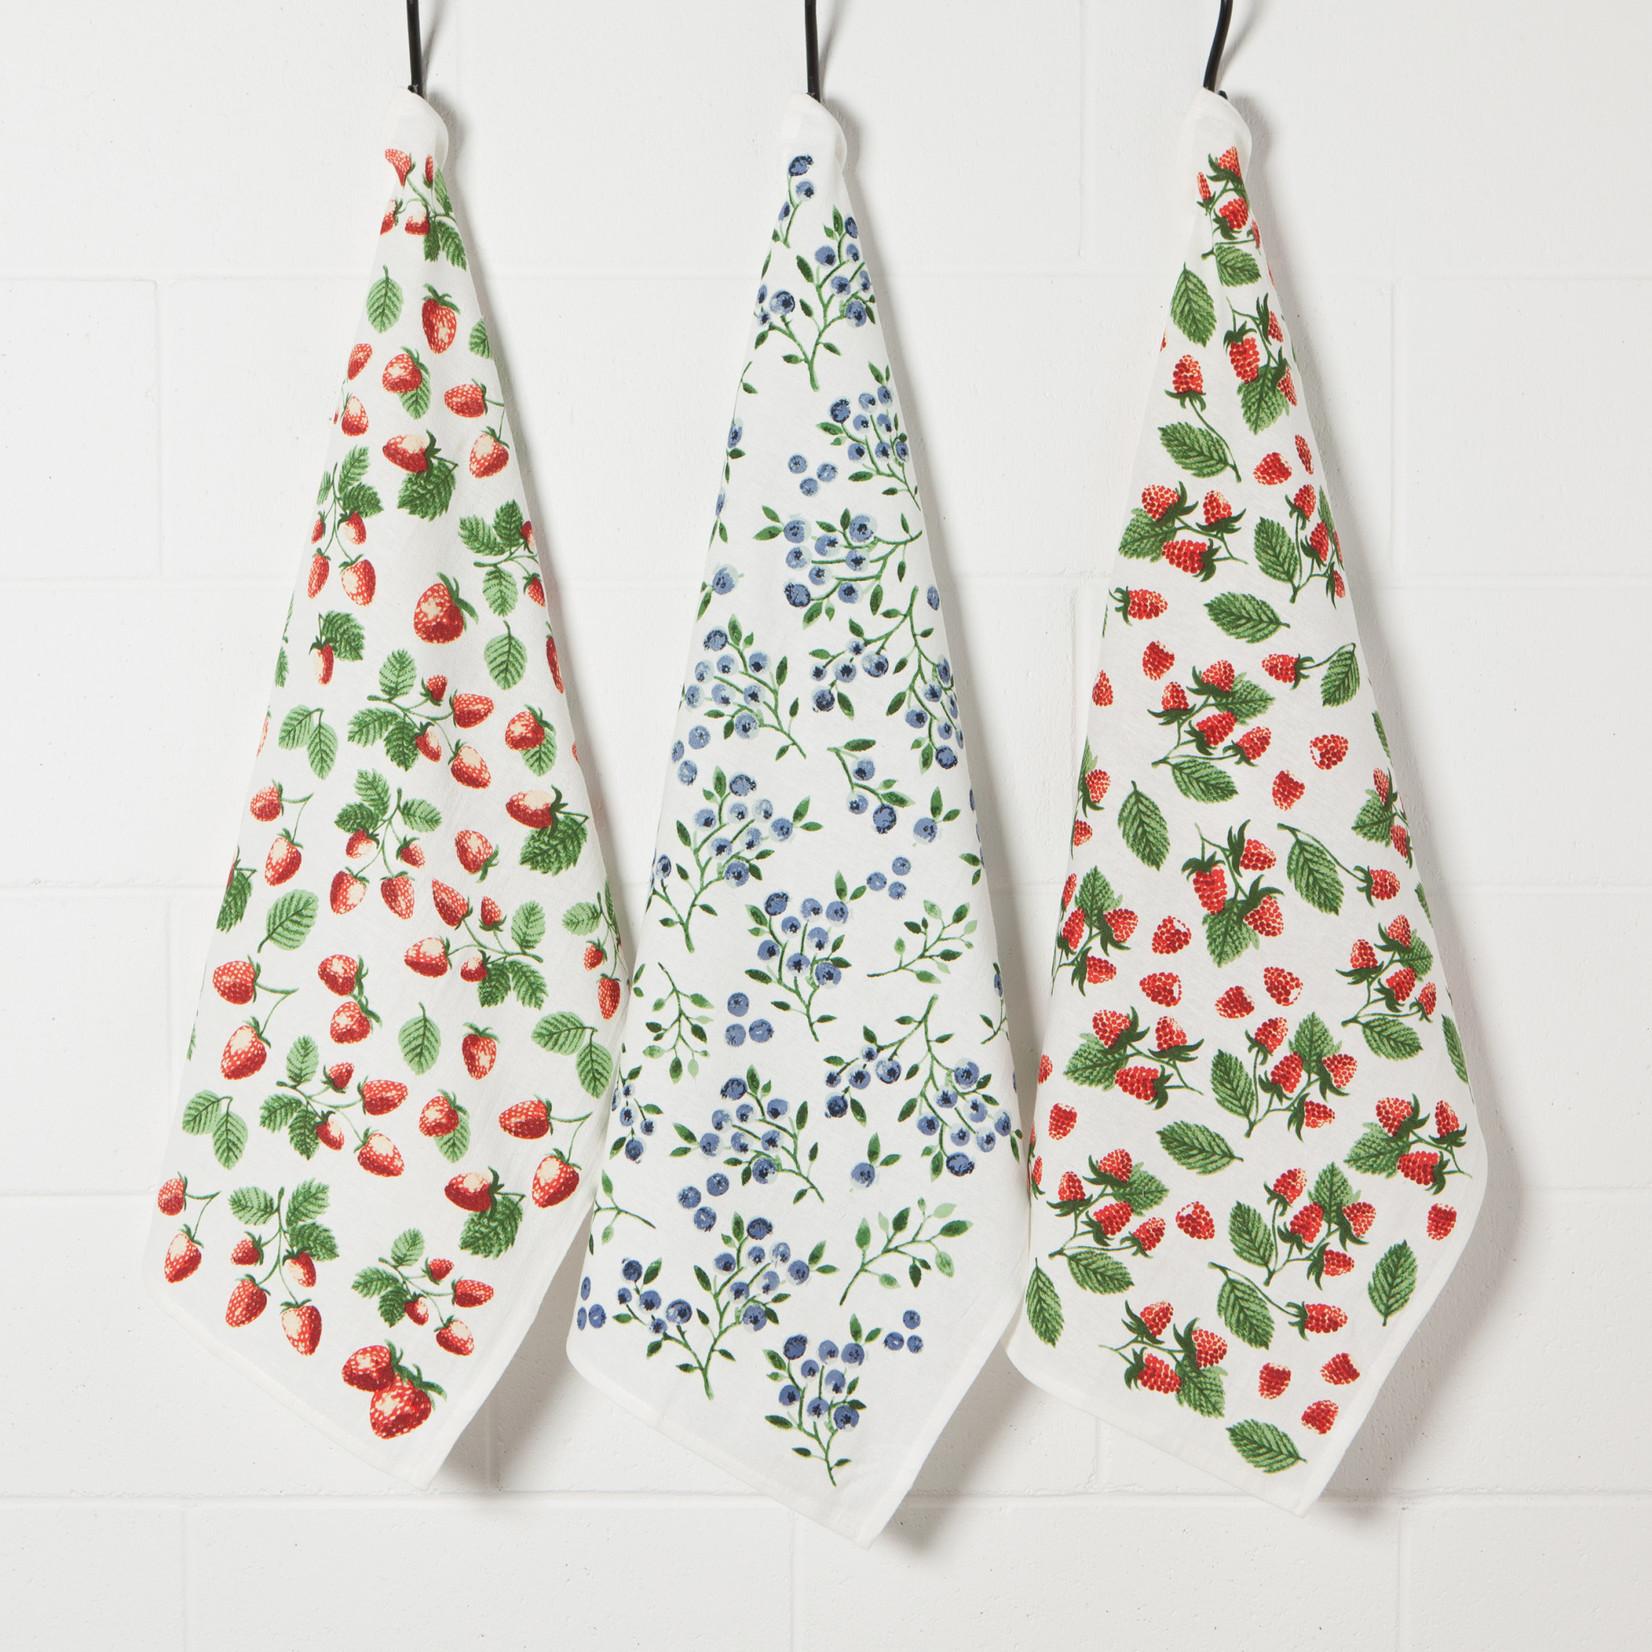 Tea Towel -  Berry Patch - Set/3